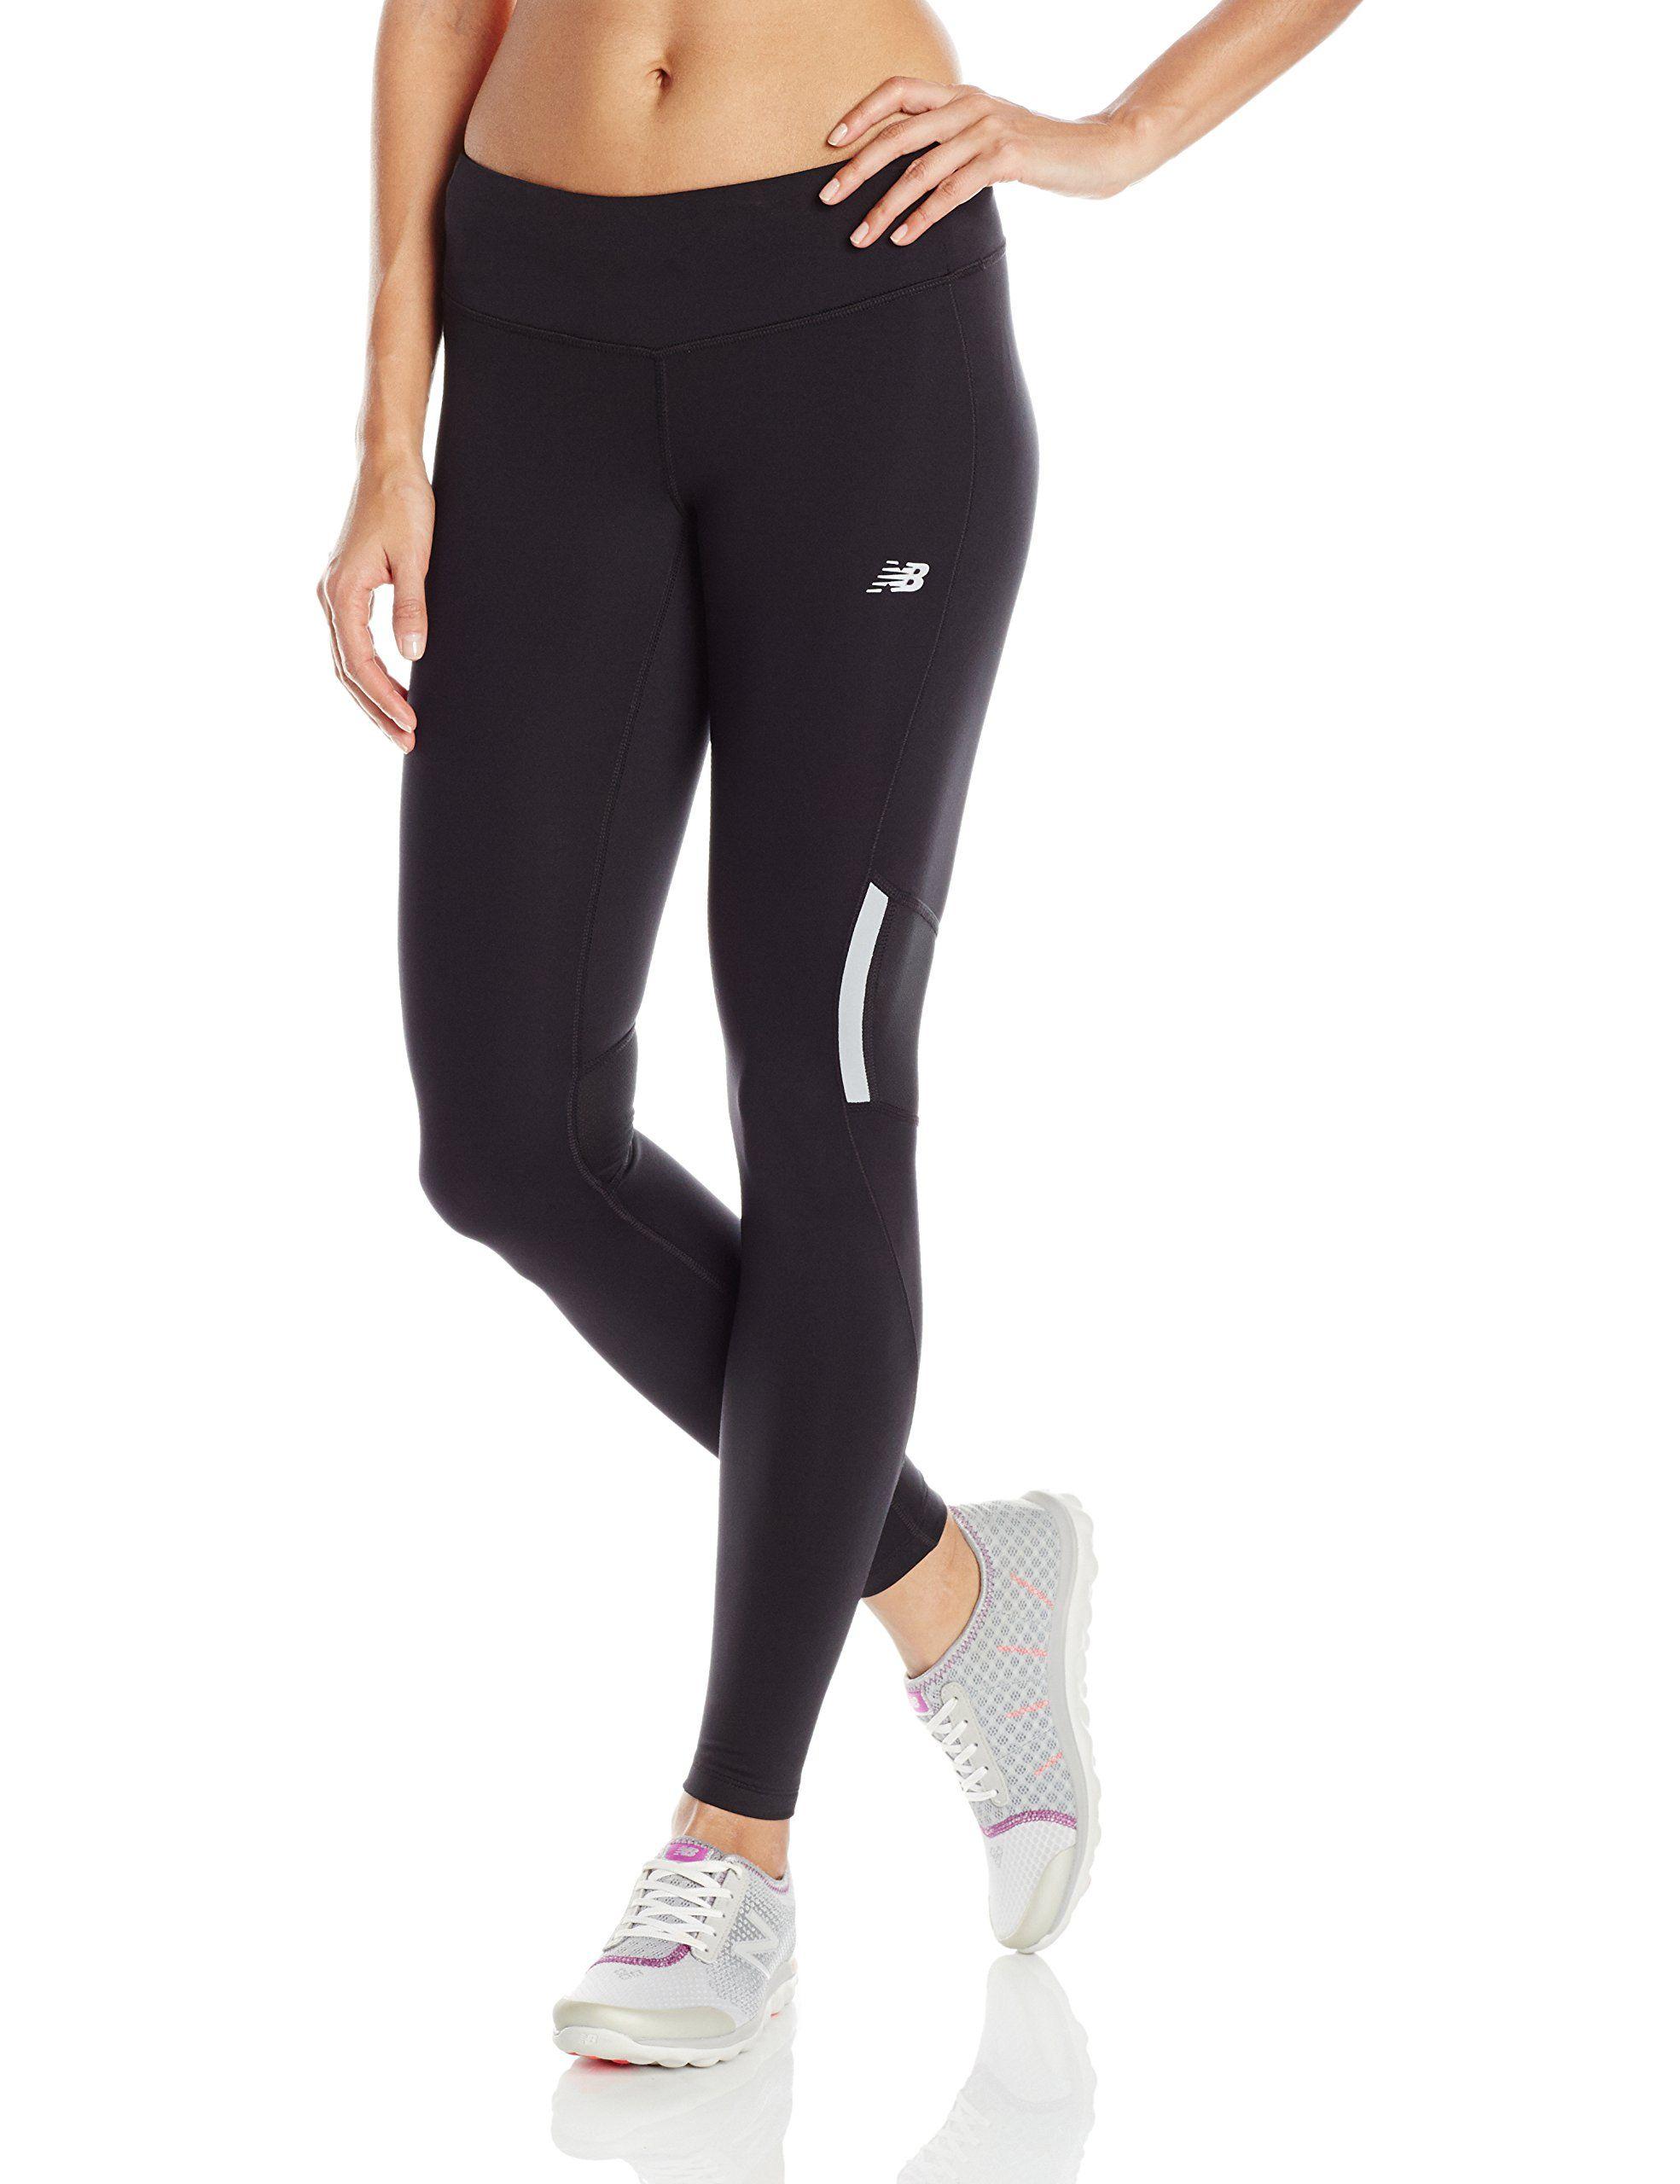 7aa2c7631edb8 New Balance Women's Run Tights, Black, Medium. Mesh panels at back knee.